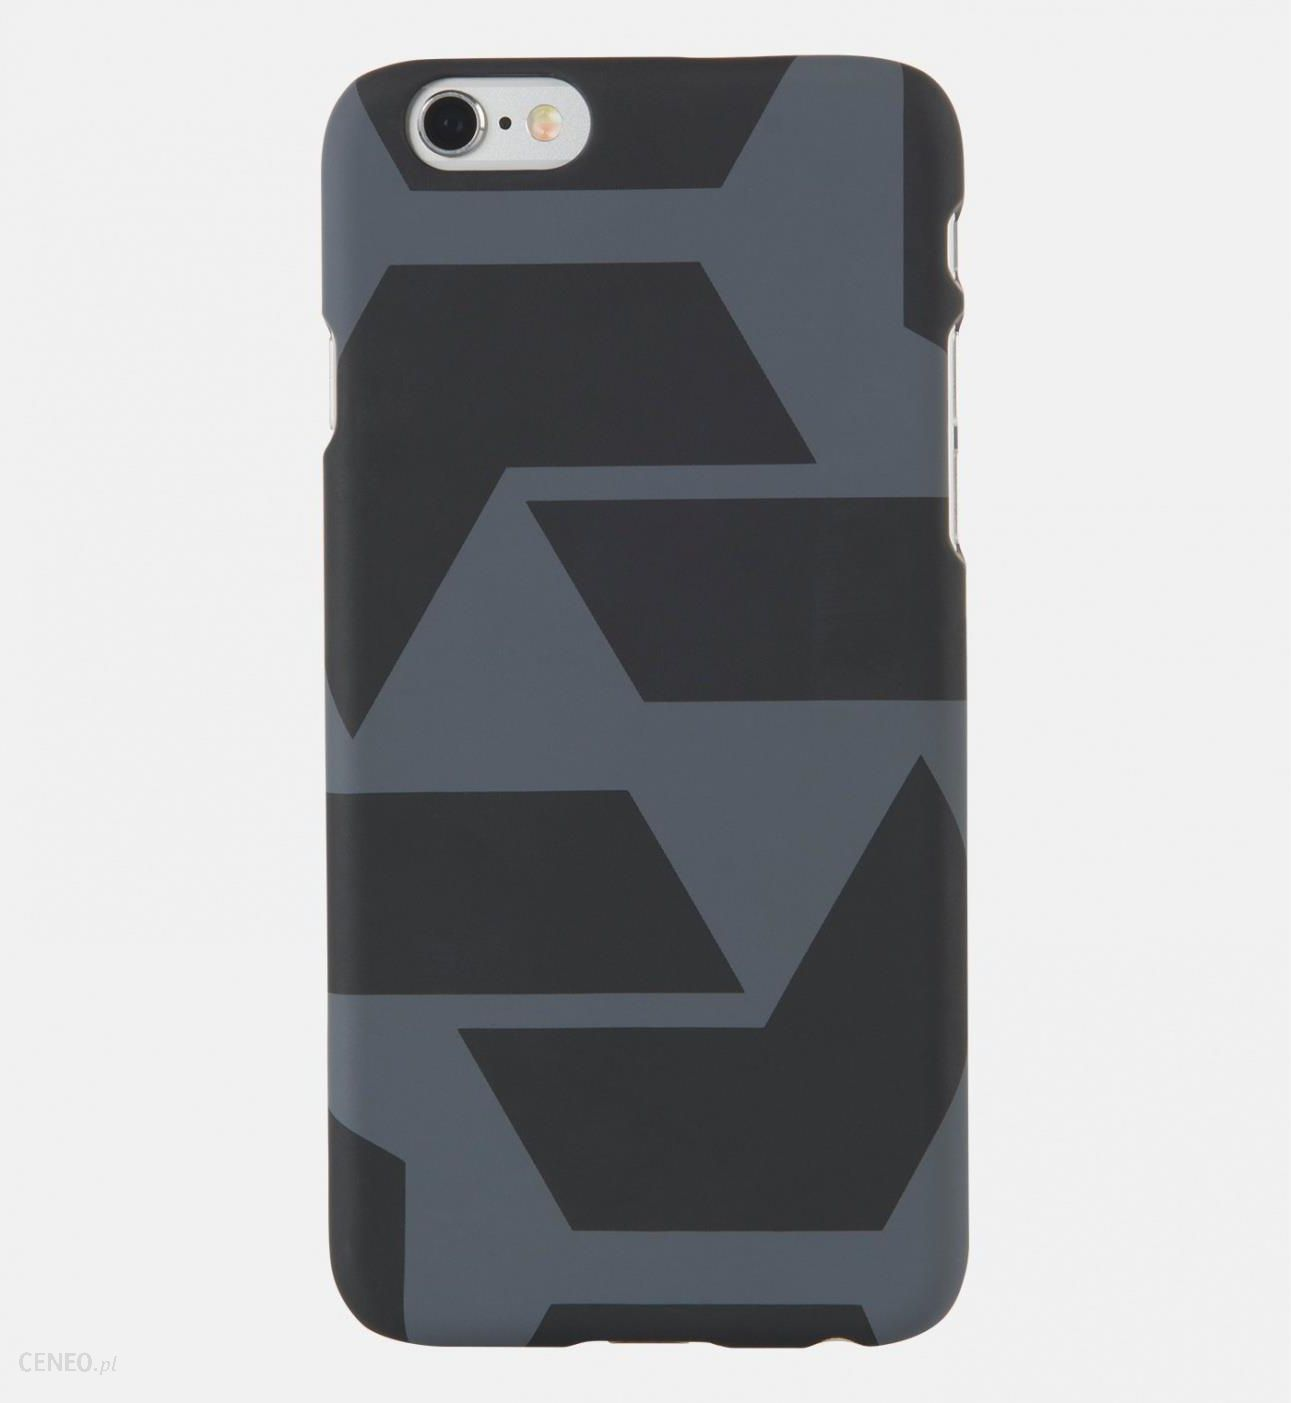 save off f5762 45f6e Peak Performance Phonecase Iphone 6/6s Black (G63422001S) - Etui na  telefon, ceny i opinie - Ceneo.pl